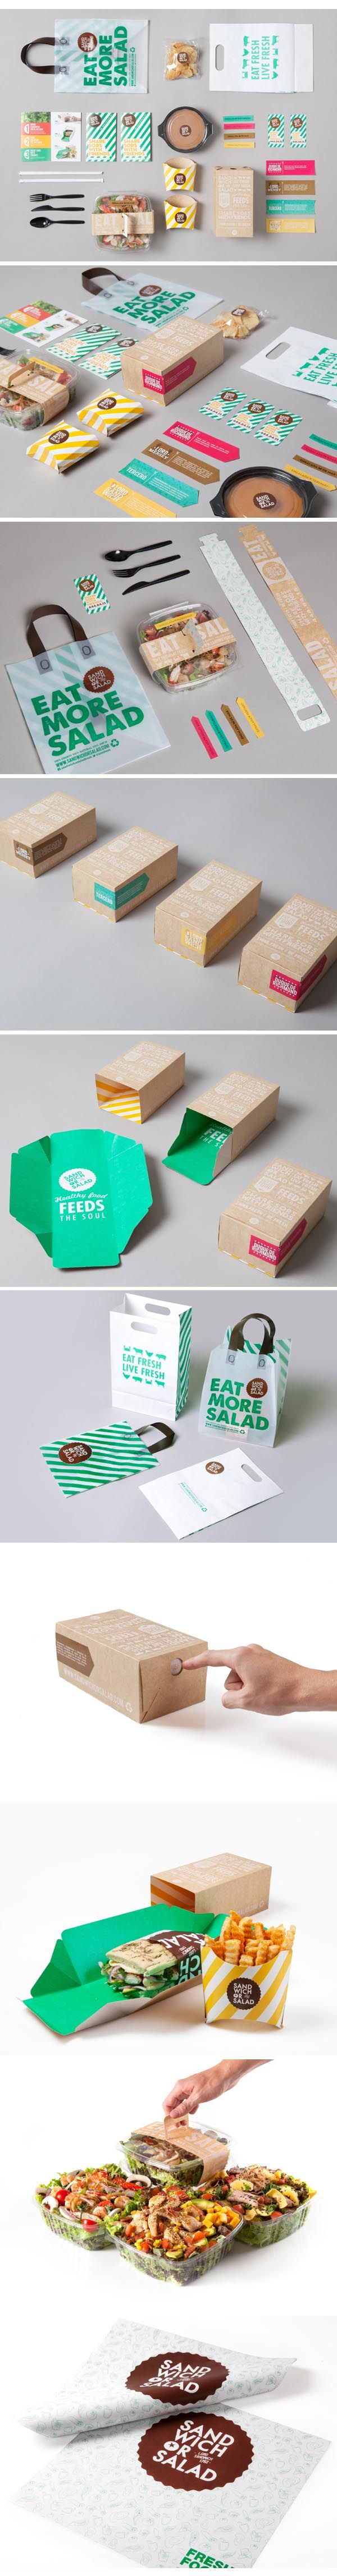 Sandwich or Salad branding